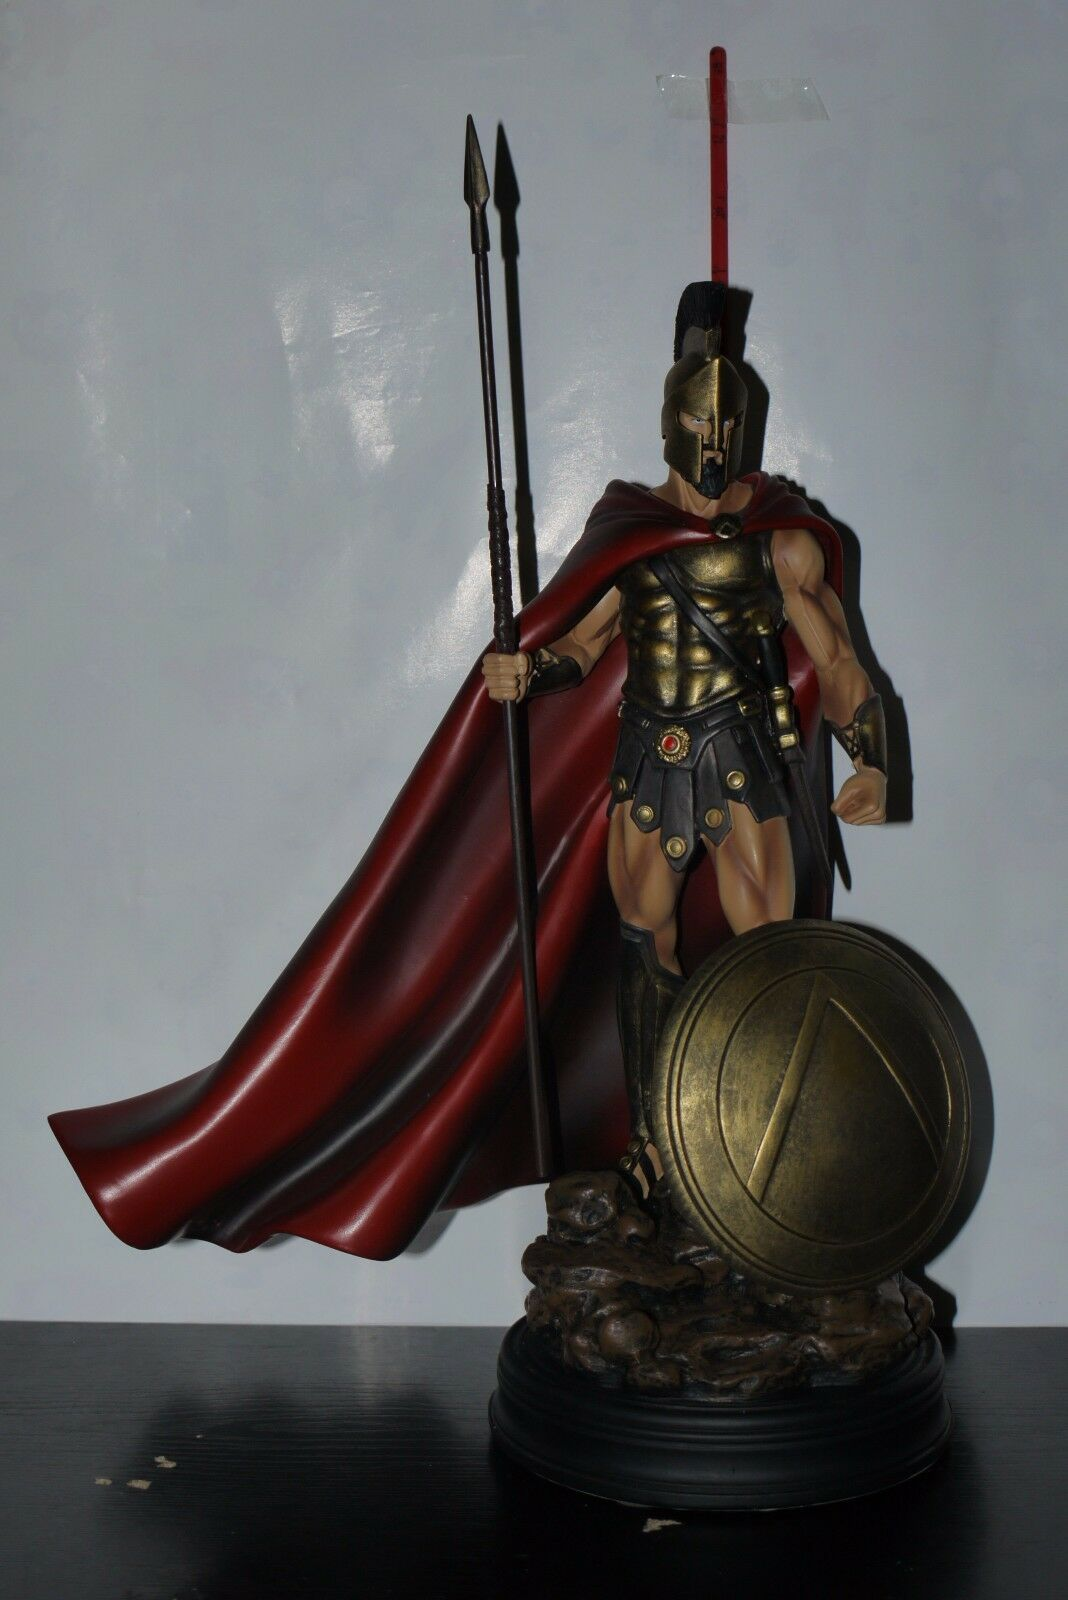 THE KING OF SPARTA Leonidas 1 6 Scale Statue ARH Studios 300 movie 431 500 BOXED